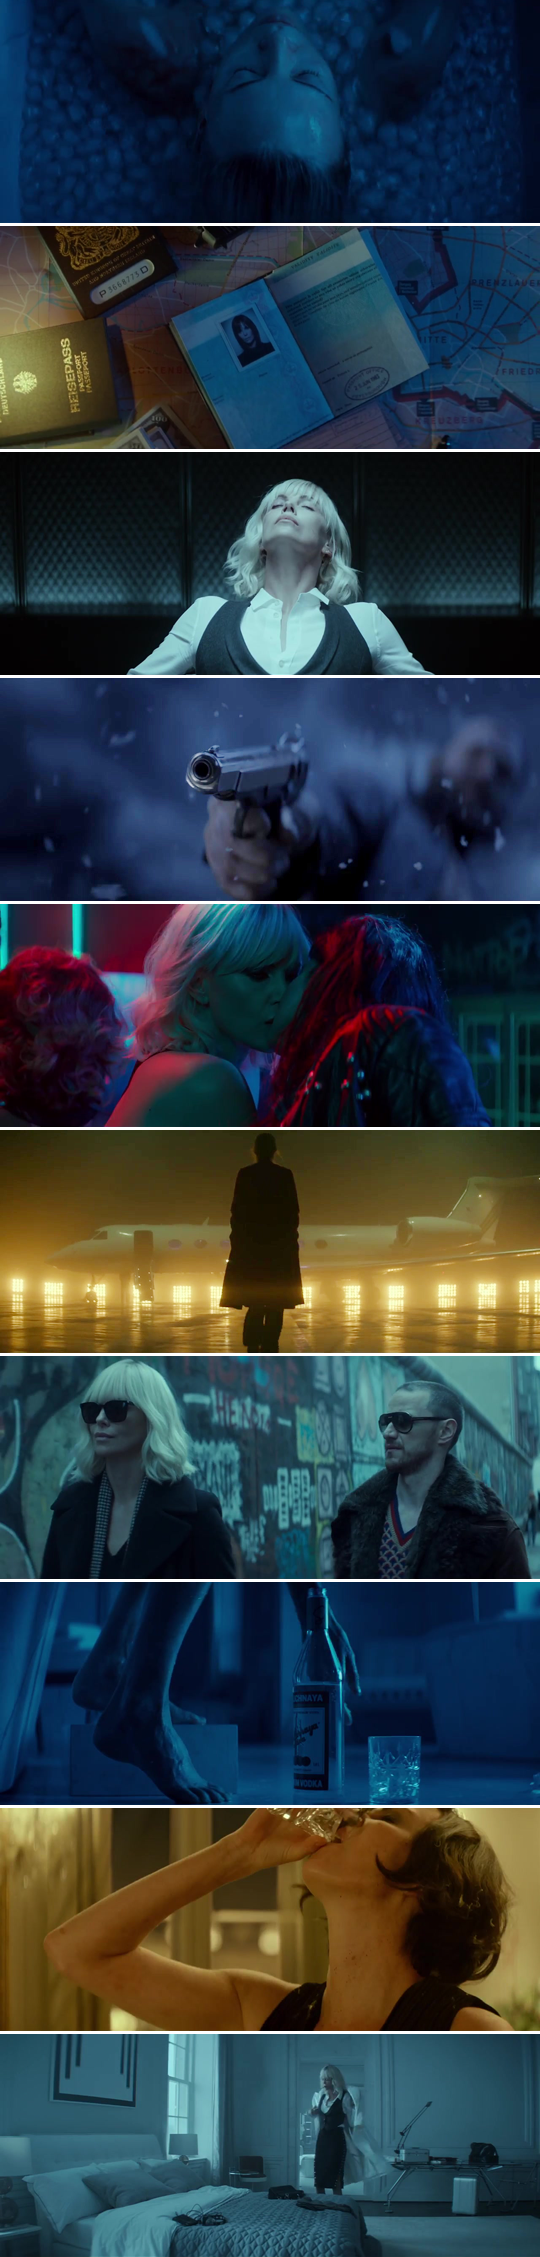 Atomic Blonde (2017), dir. David Leitch